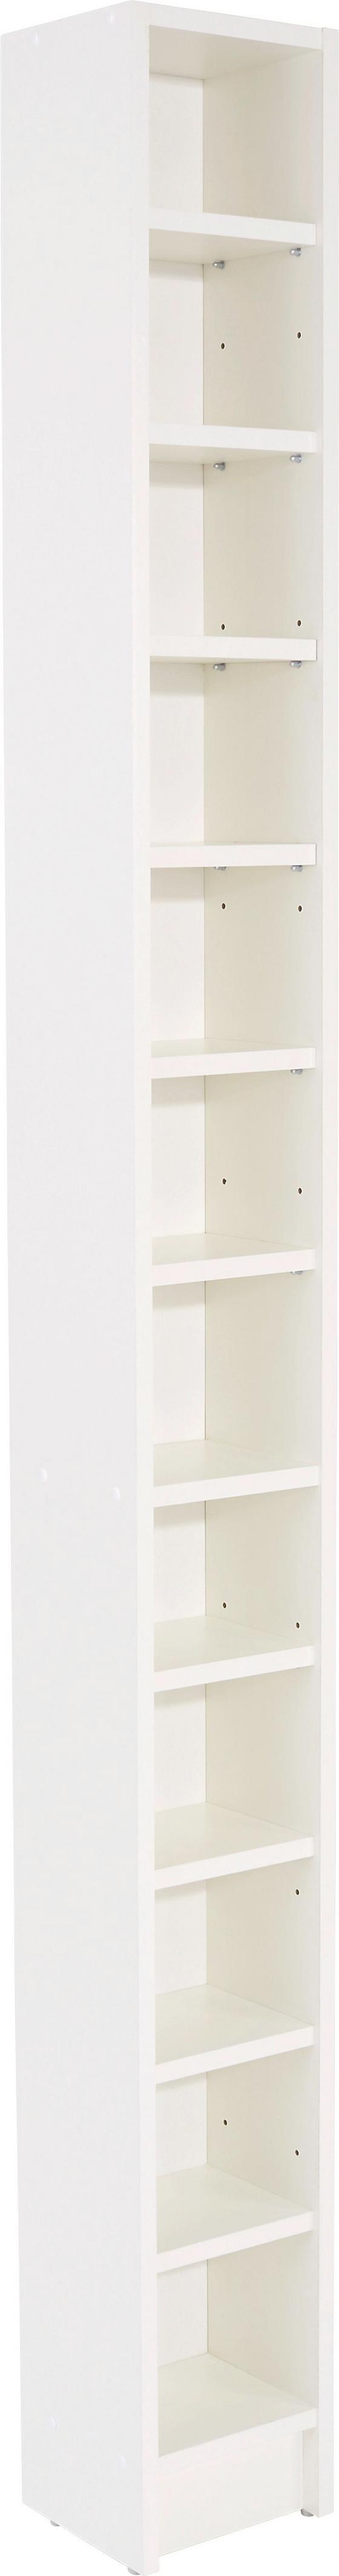 Cd-regal Felix - Weiß, MODERN, Holzwerkstoff (20/201,8/16,5cm) - Sonne